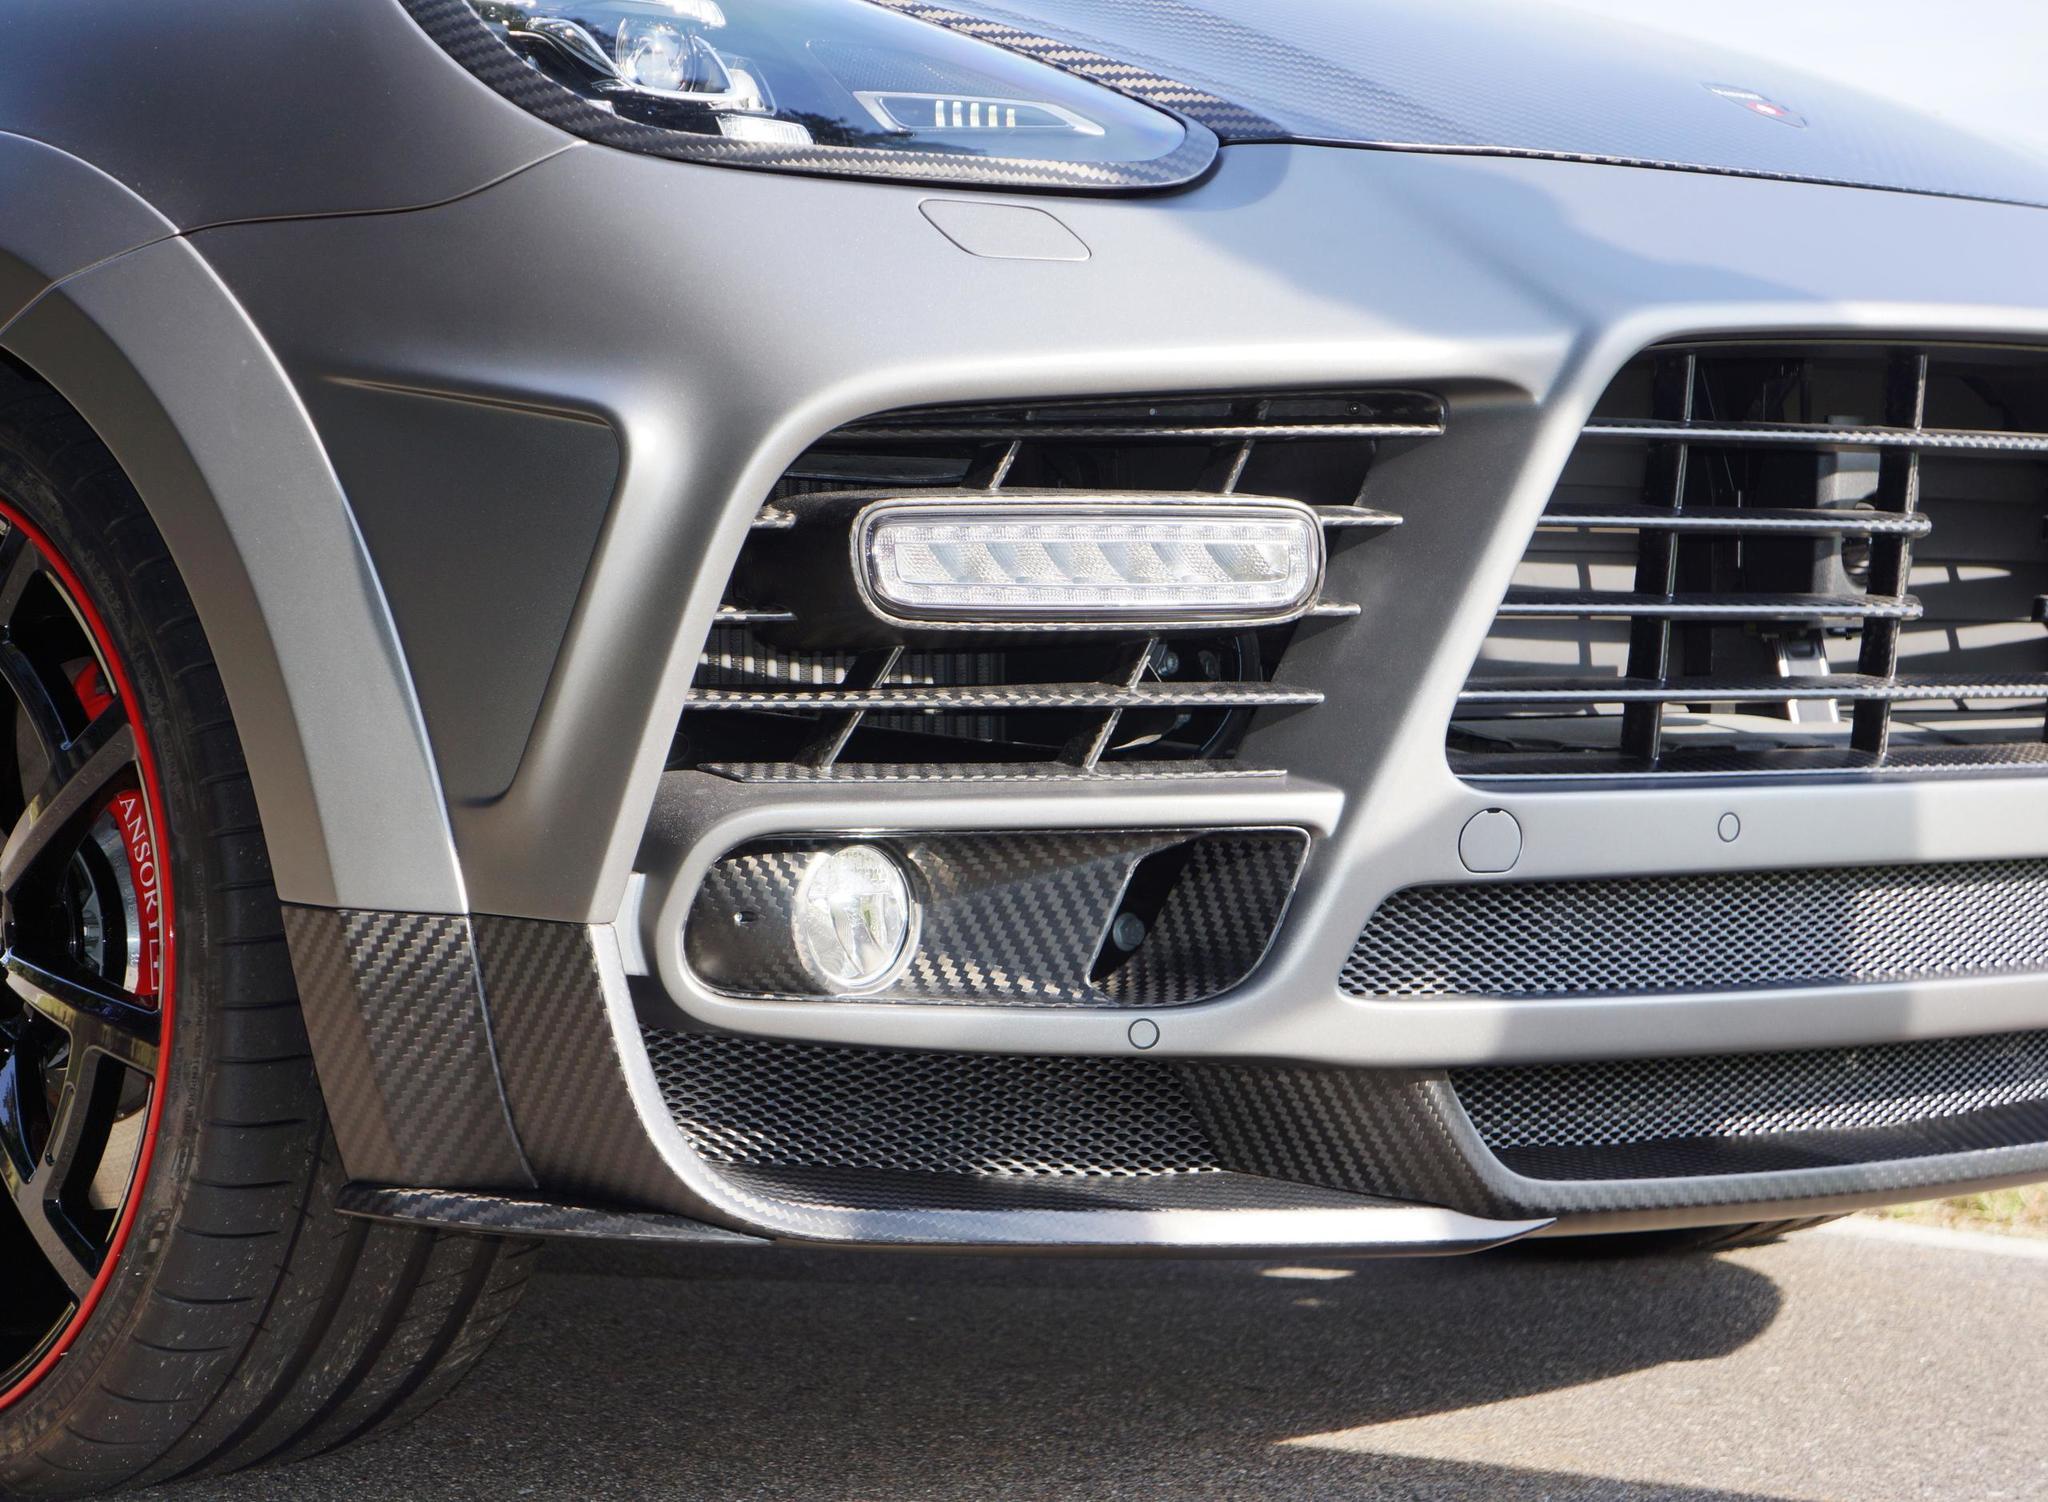 Mansory body kit for Porsche Cayenne new model